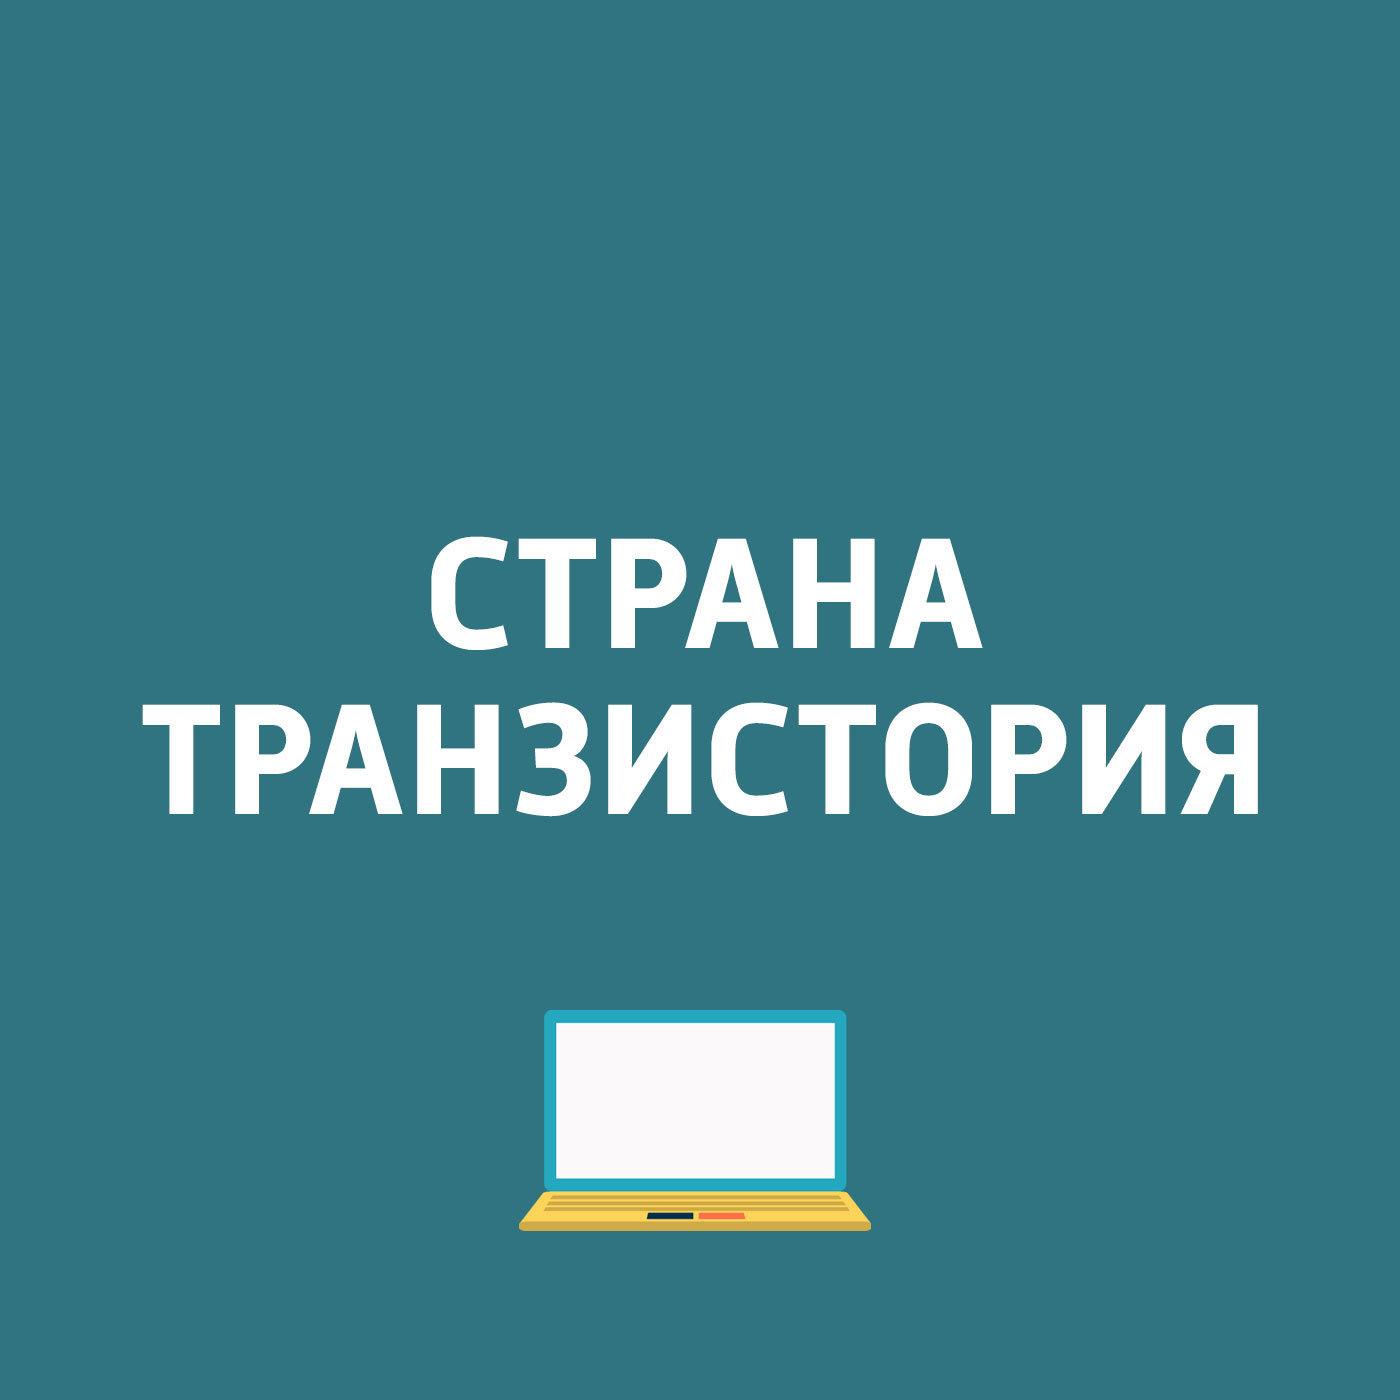 Картаев Павел Smart Band HW01; «Отпечатки войны... картаев павел хворост